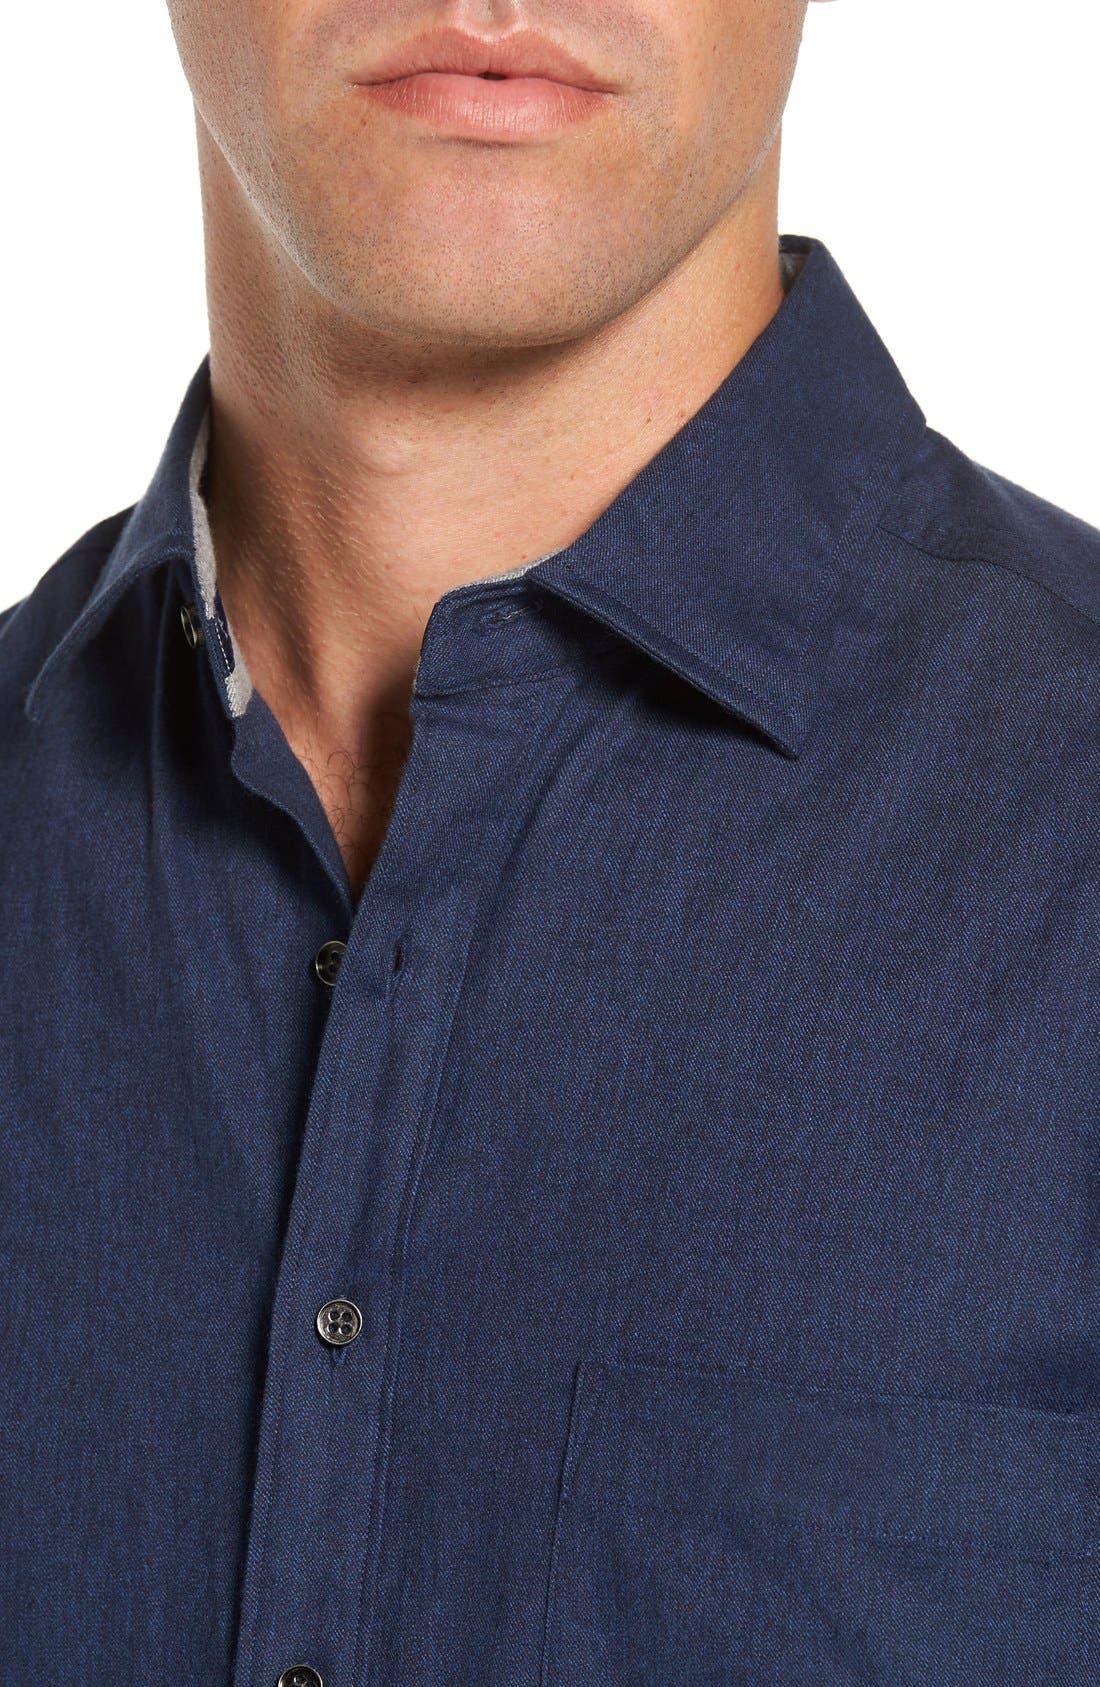 'Sinclair' Trim Fit Brushed Twill Sport Shirt,                             Alternate thumbnail 4, color,                             Indigo